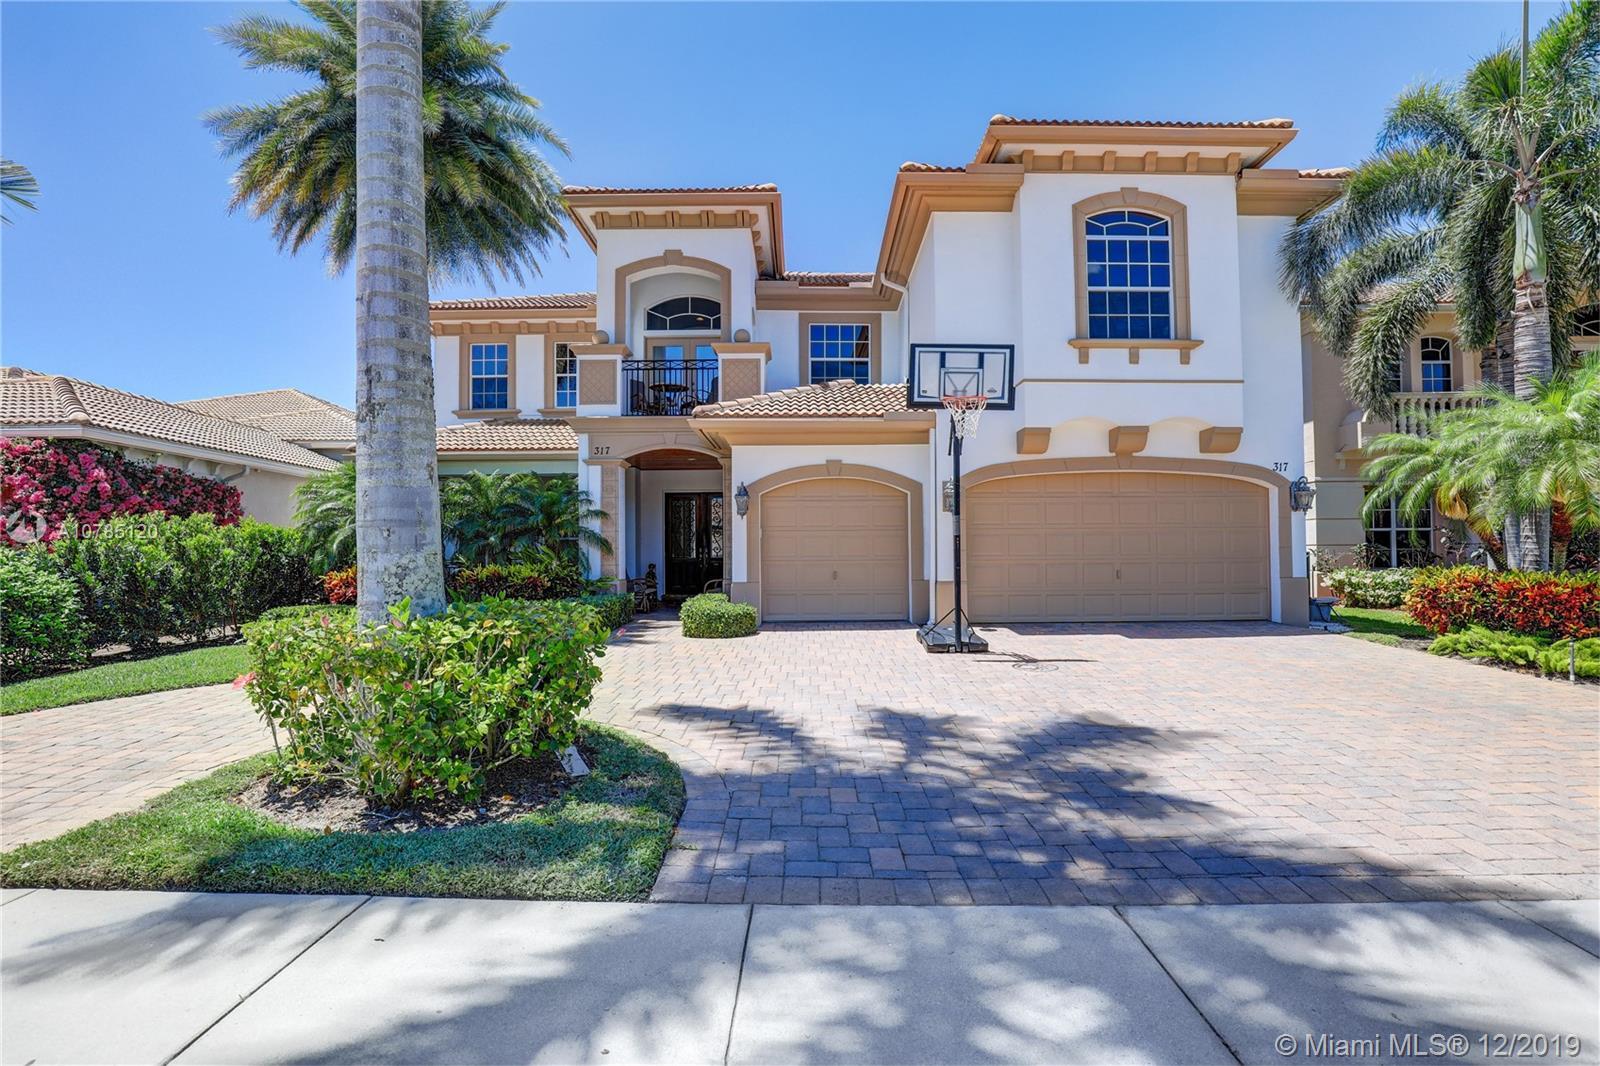 317 Charroux Dr, Palm Beach Gardens, FL 33410